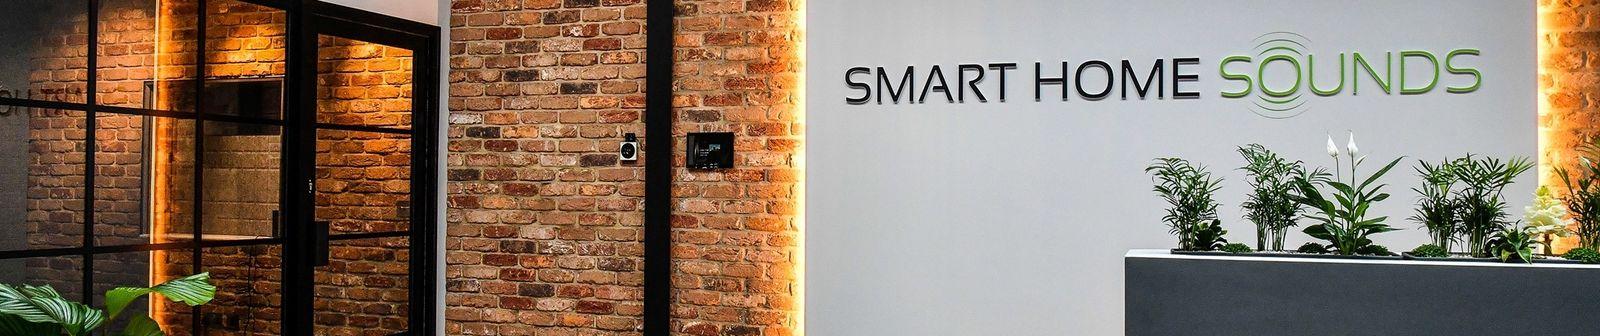 Smart Home Sounds 1